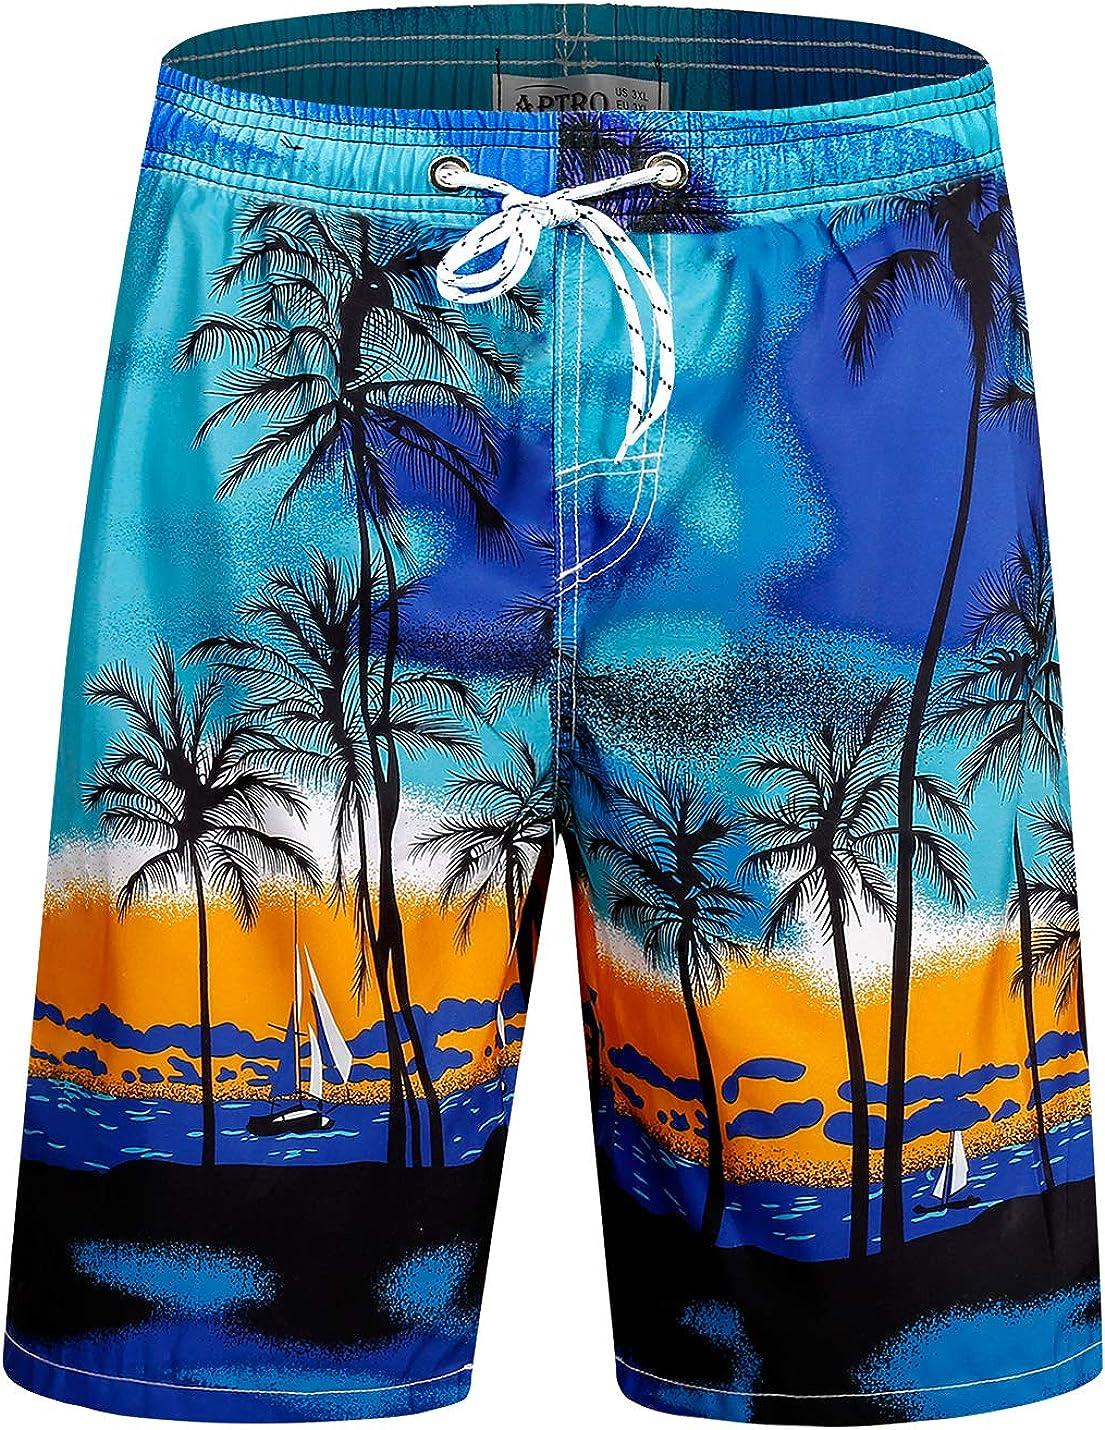 APTRO Men's Swim Trunks Quick Dry Swimsutis Beach Shorts Bathing Suits